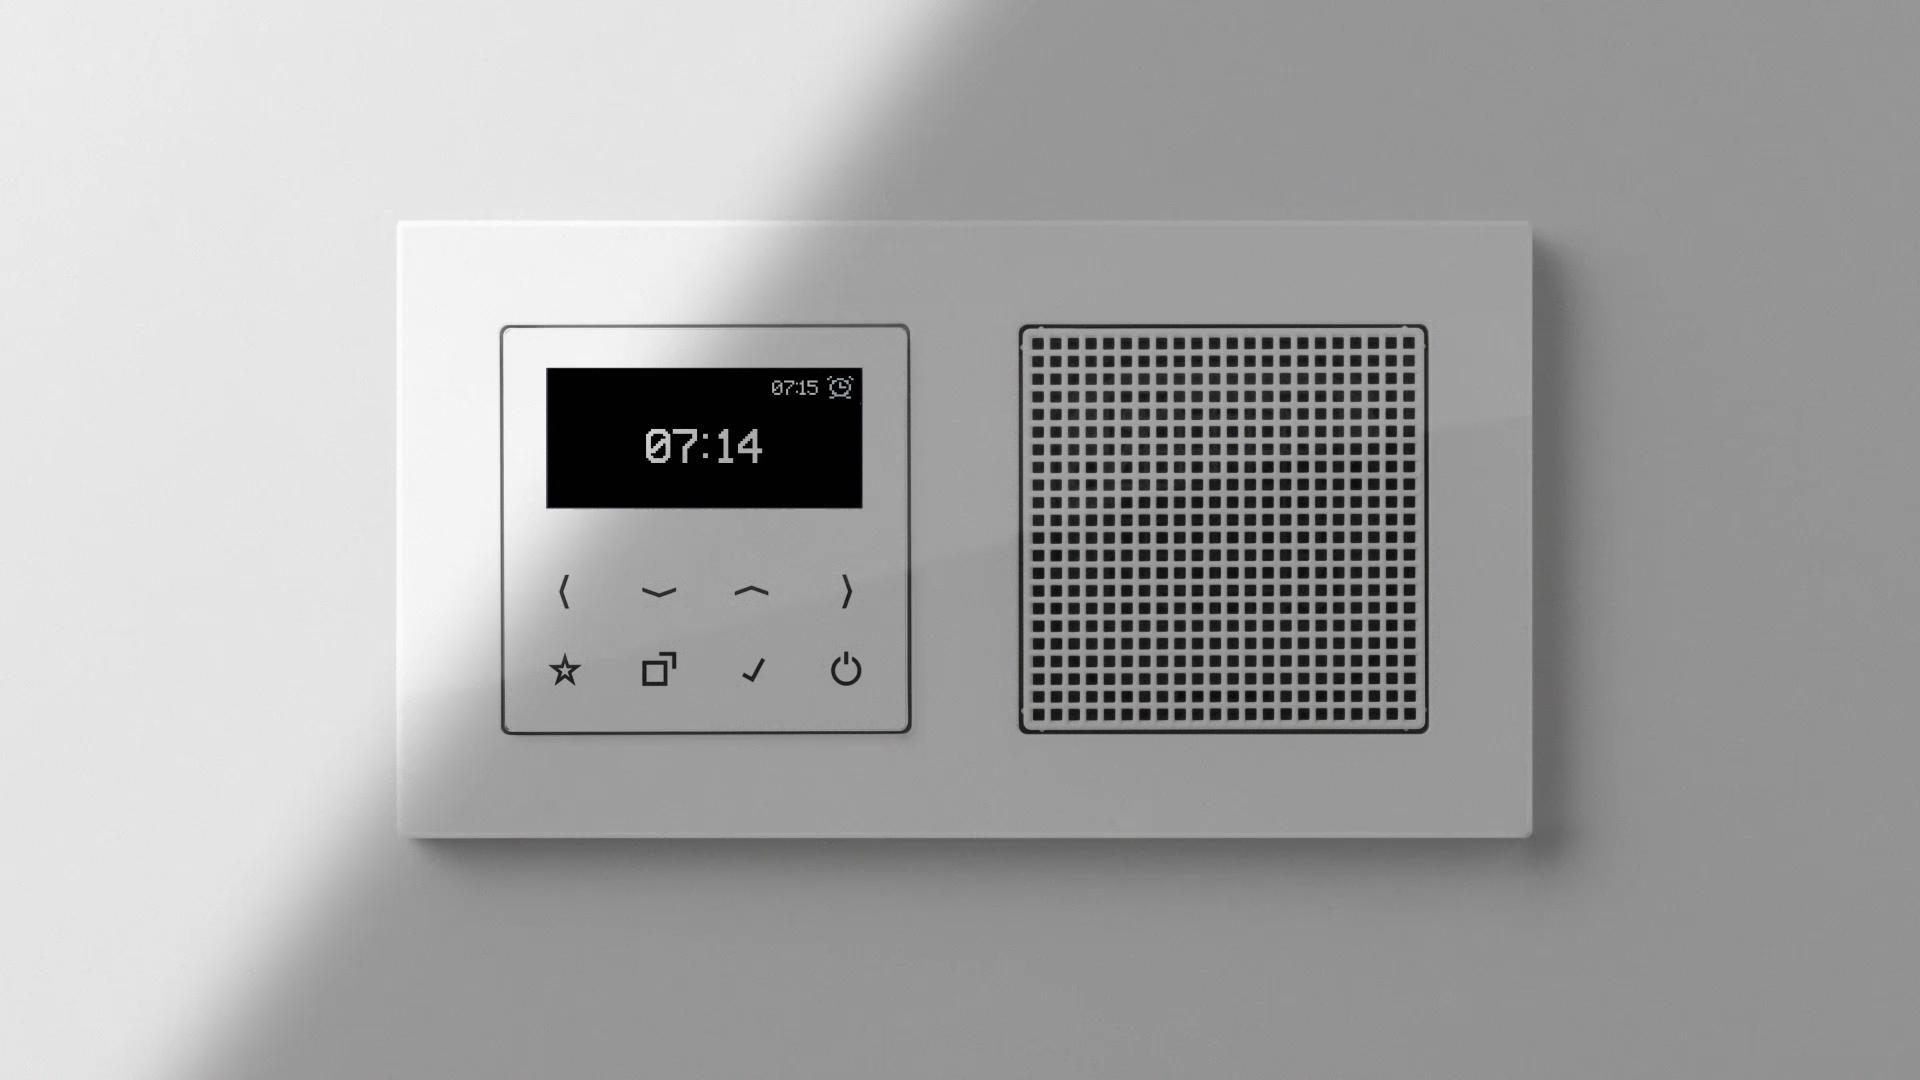 JUNG - Smart Radio DAB+ trifft perfekt den Ton